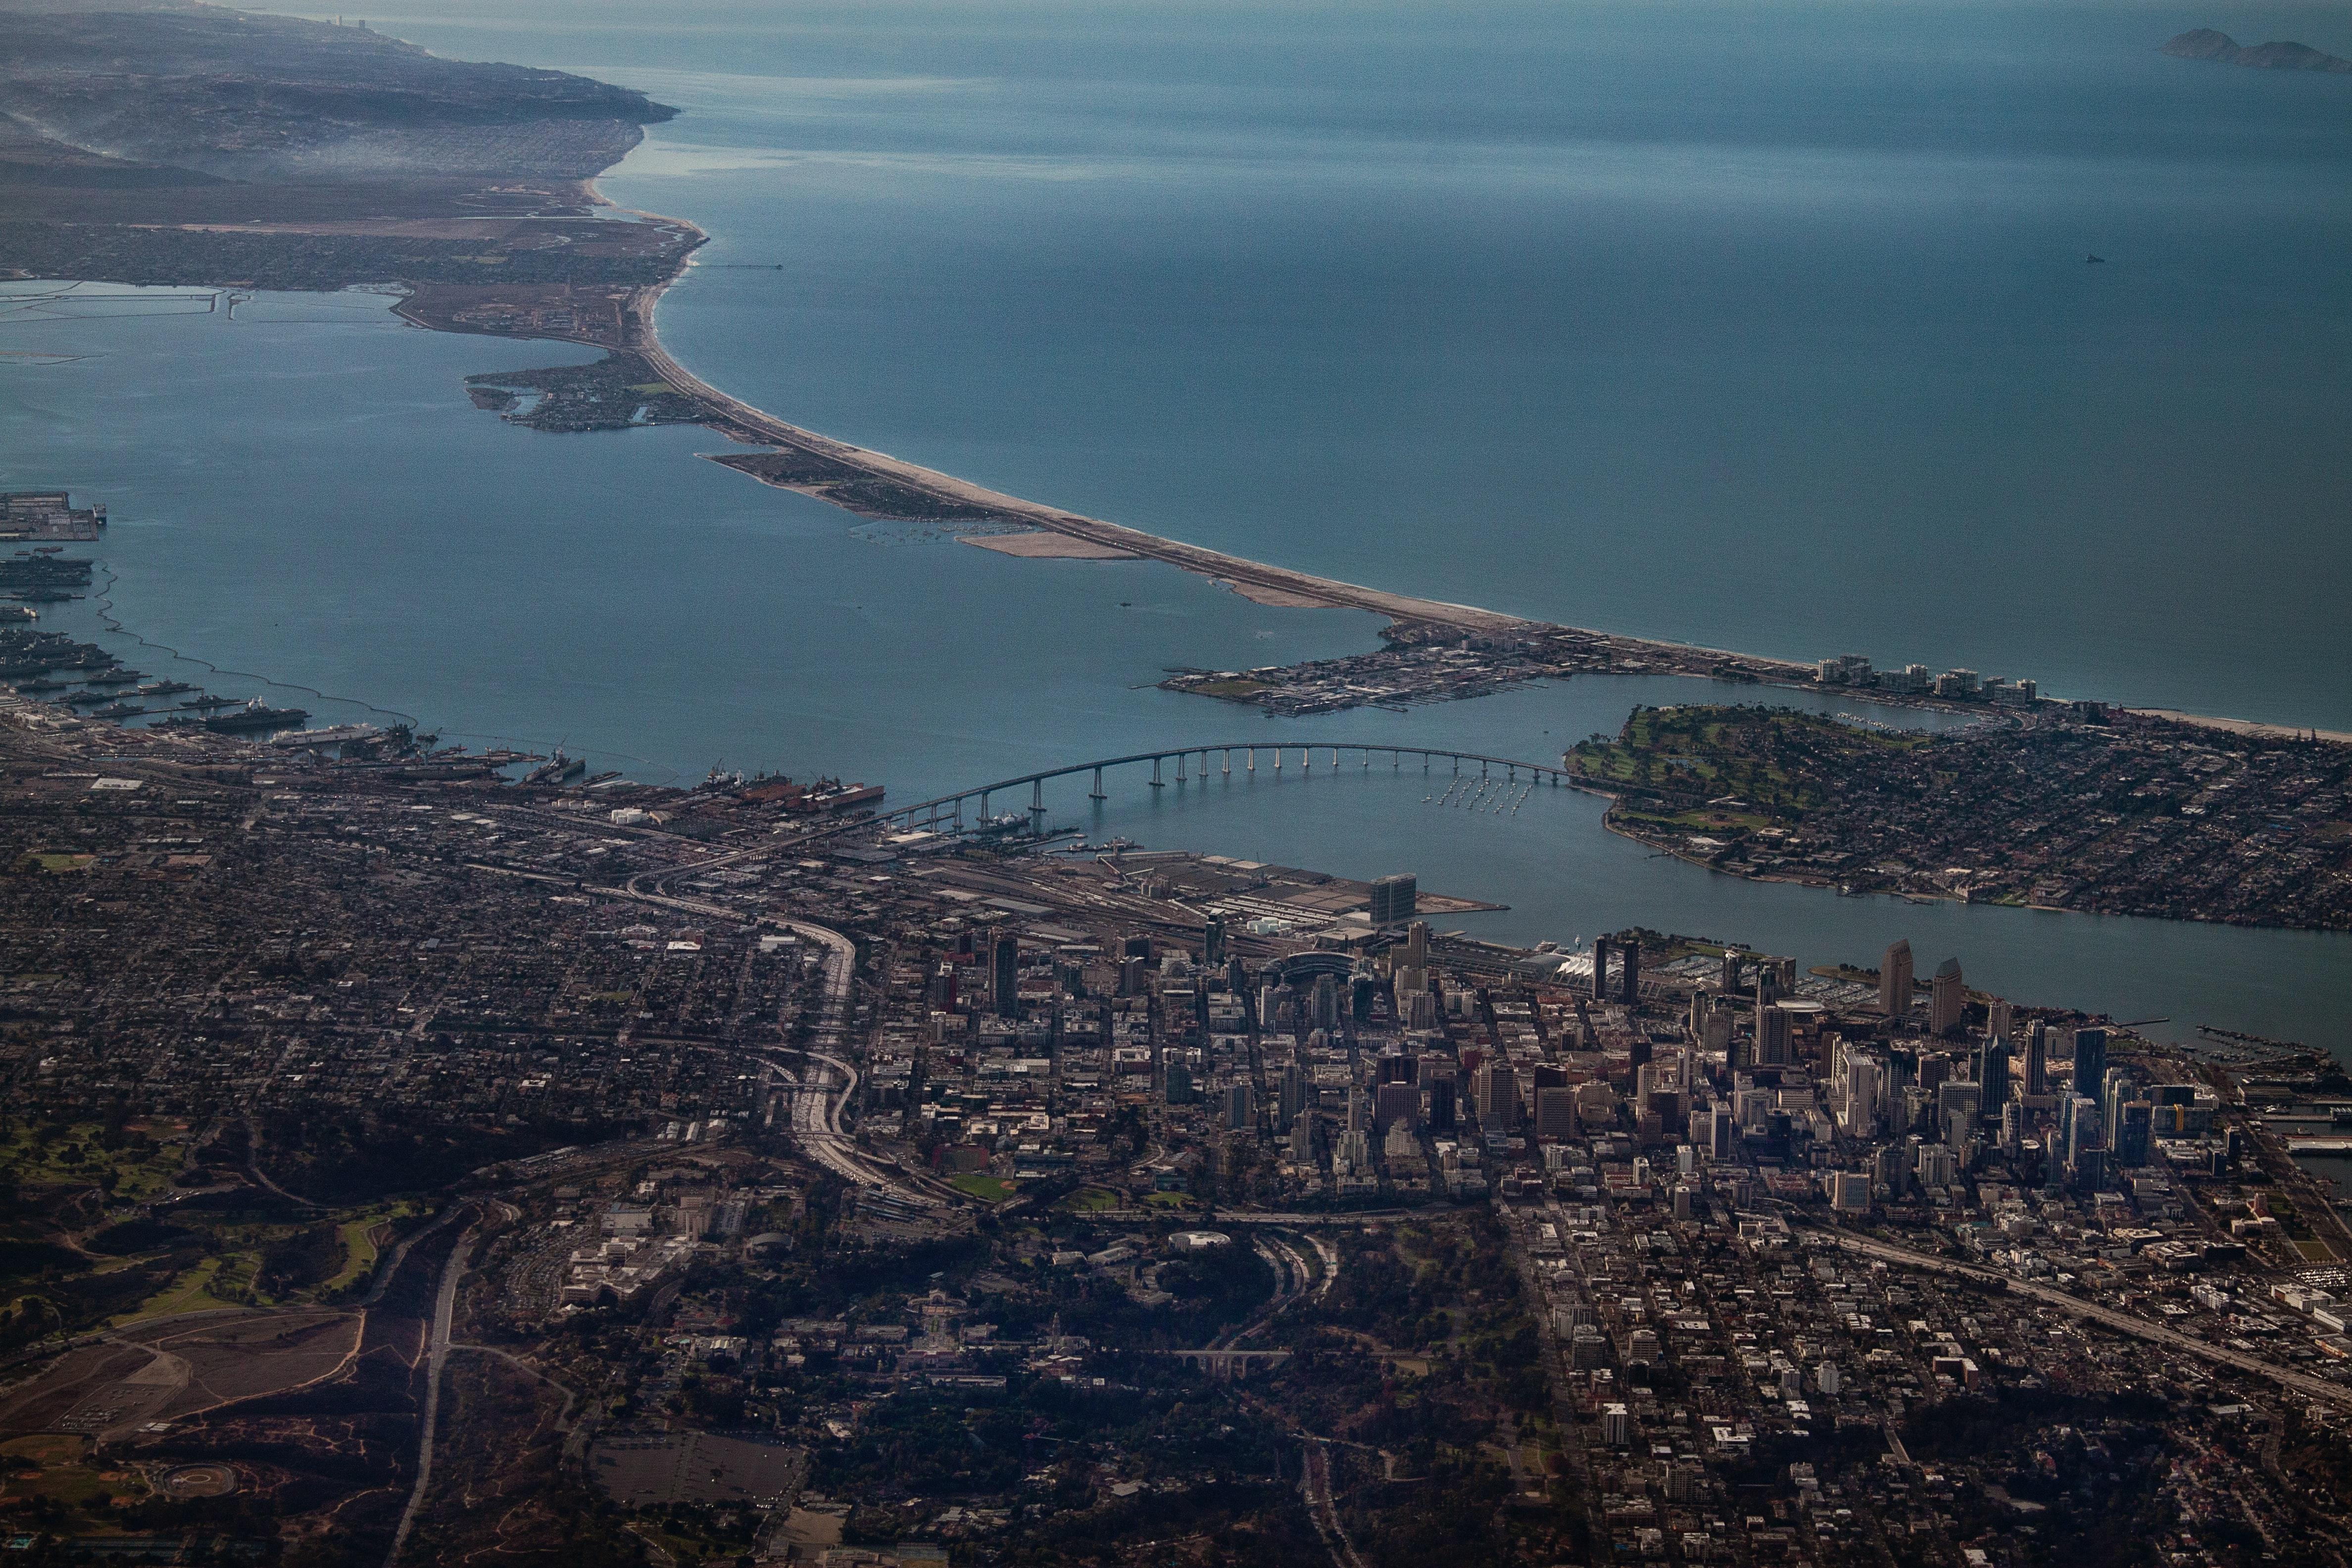 Aerial photography of downtown San Diego including the Coronado bridge